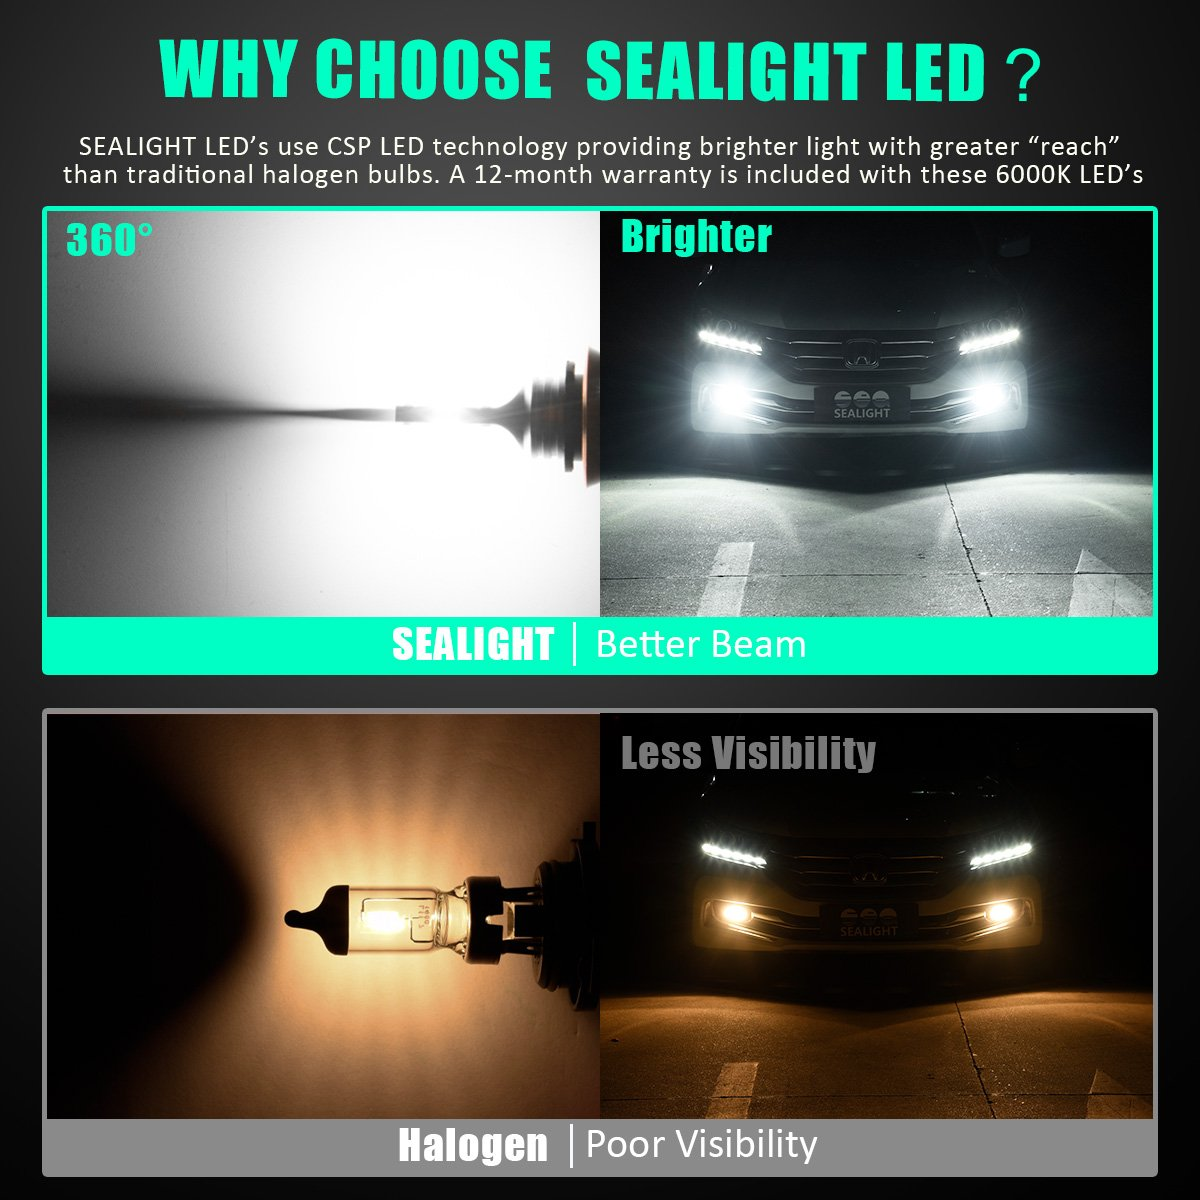 SEALIGHT 5202 5201 LED Fog Light Bulbs Super Bright PS19W LED Bulb DOT Approved Xenon Cool White 6000K Pack of 2